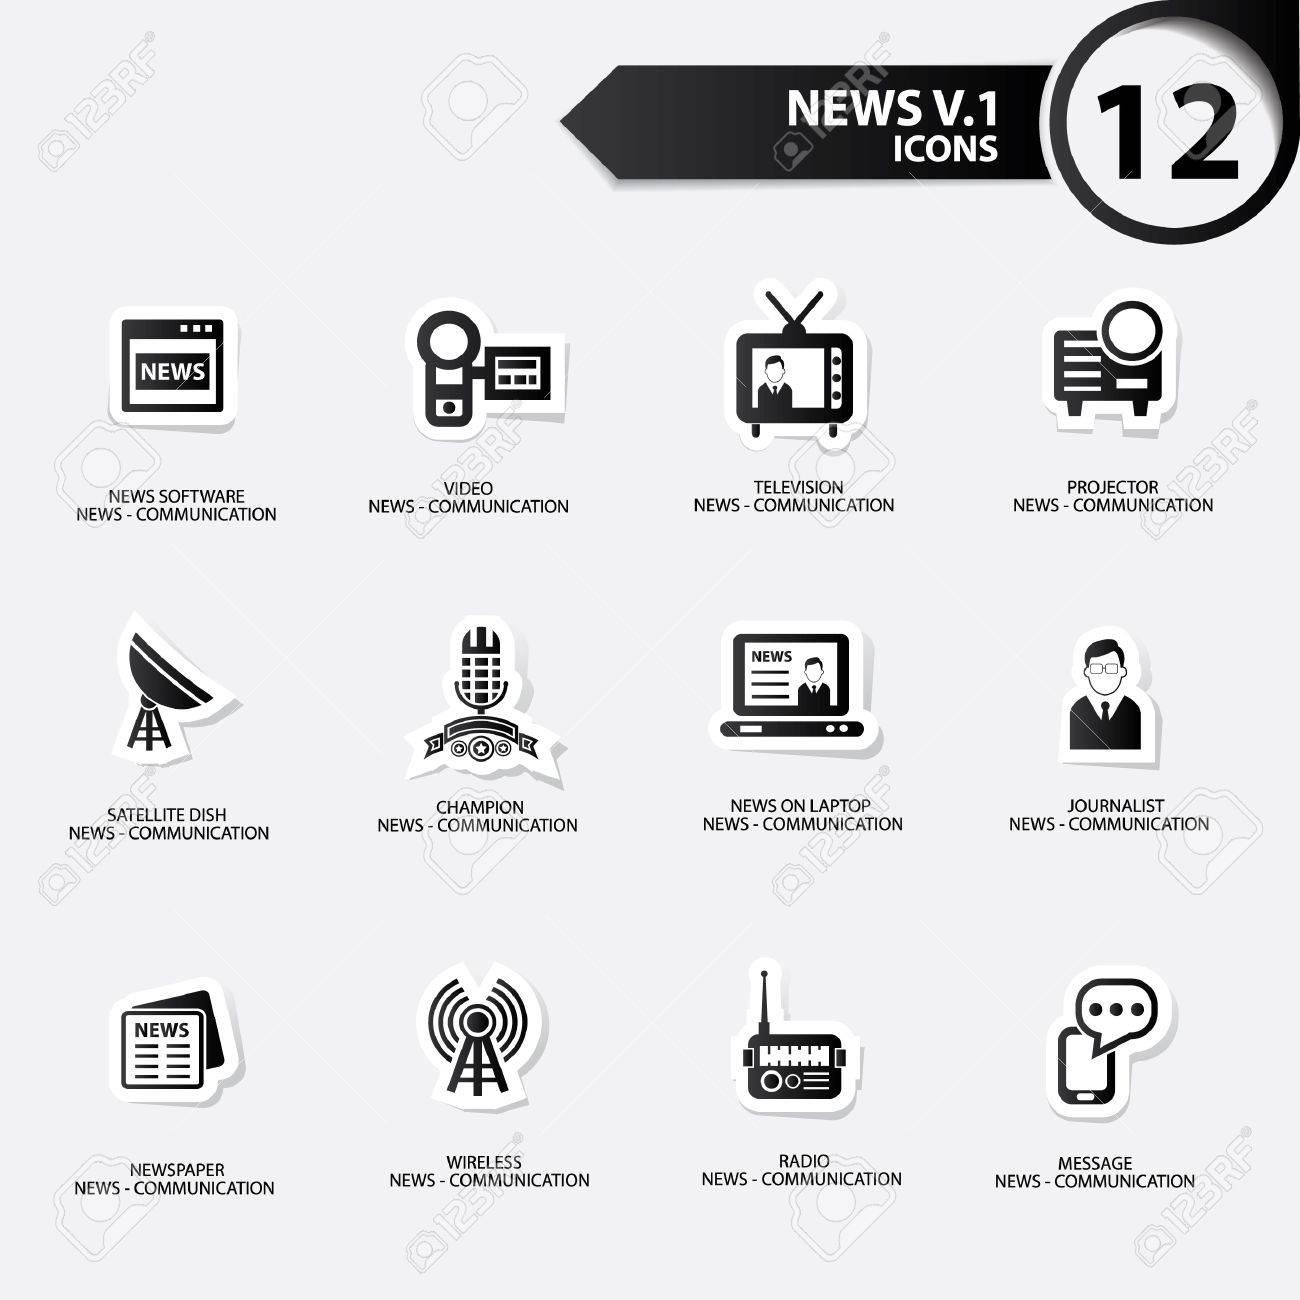 News icon set 1,black version vector Stock Vector - 21283193